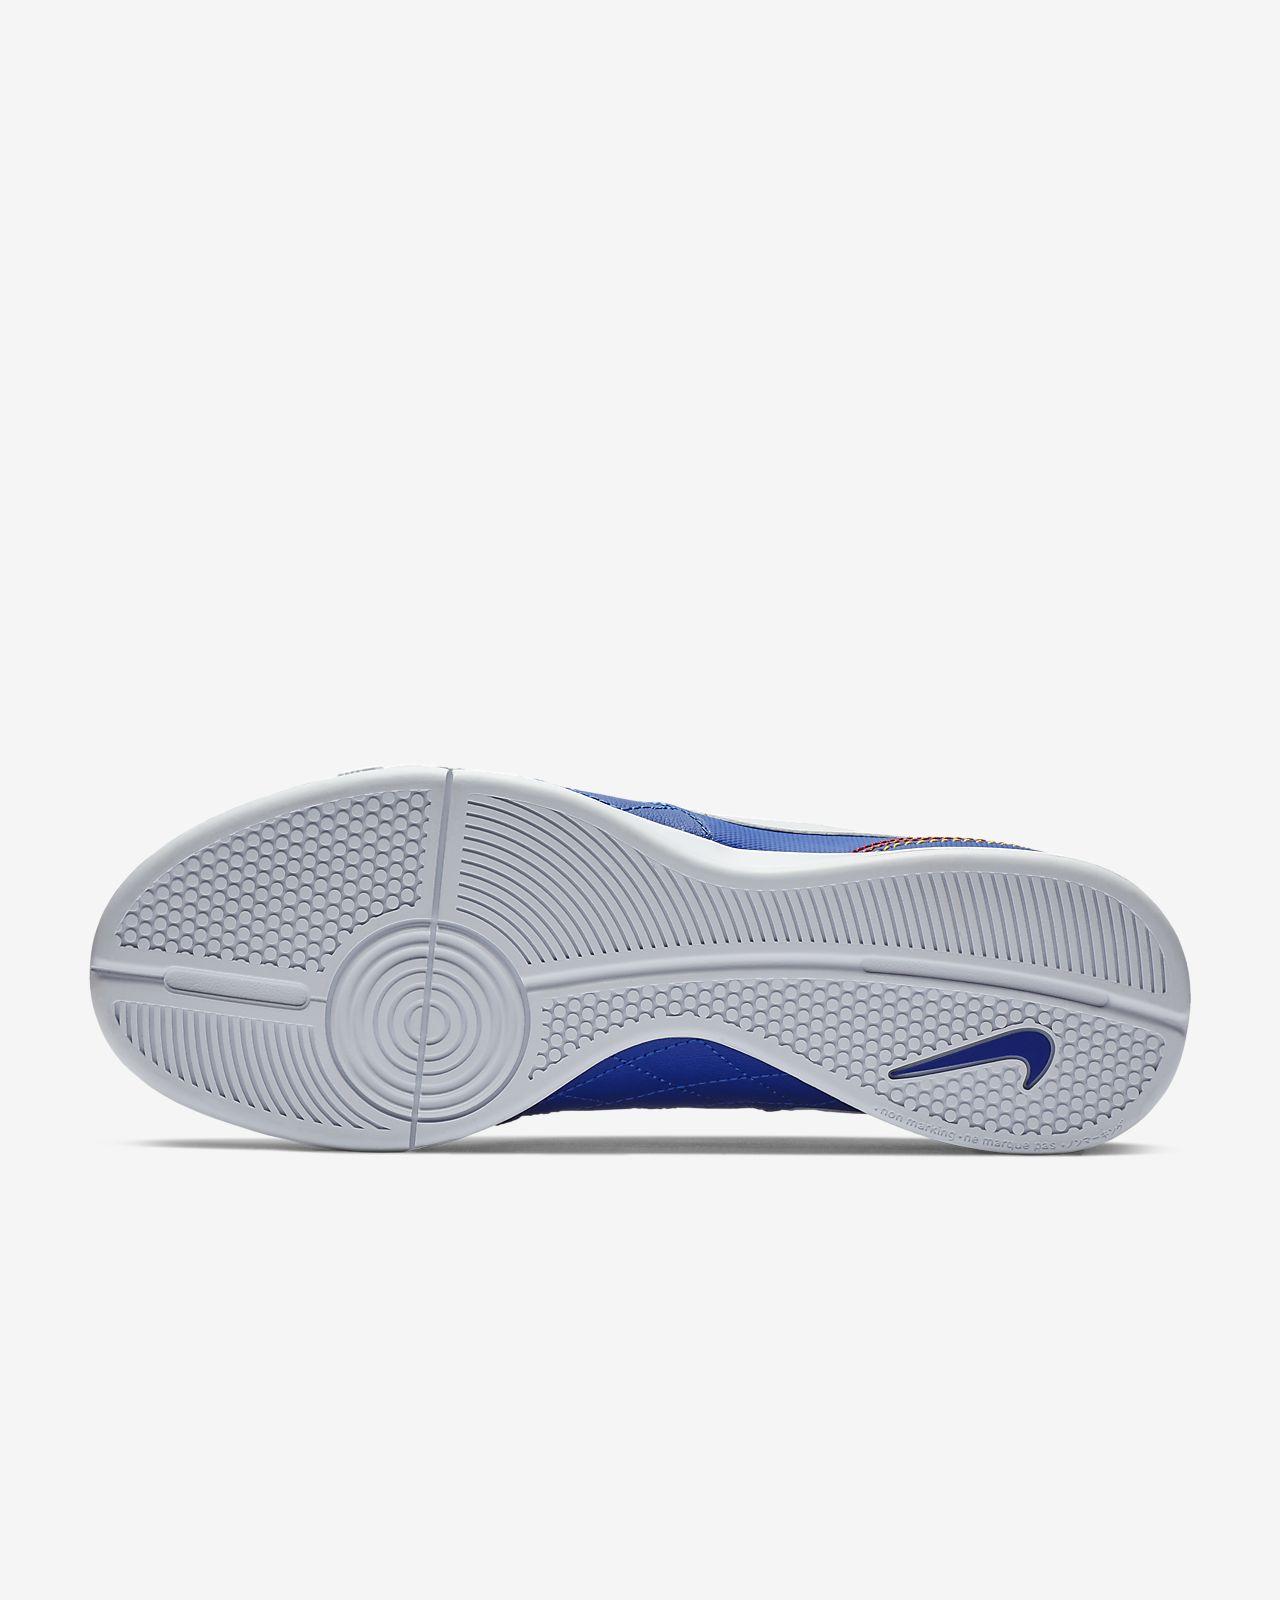 online store d4cd4 883f3 Nike TiempoX Legend VII Academy 10R Indoor/Court Football Shoe